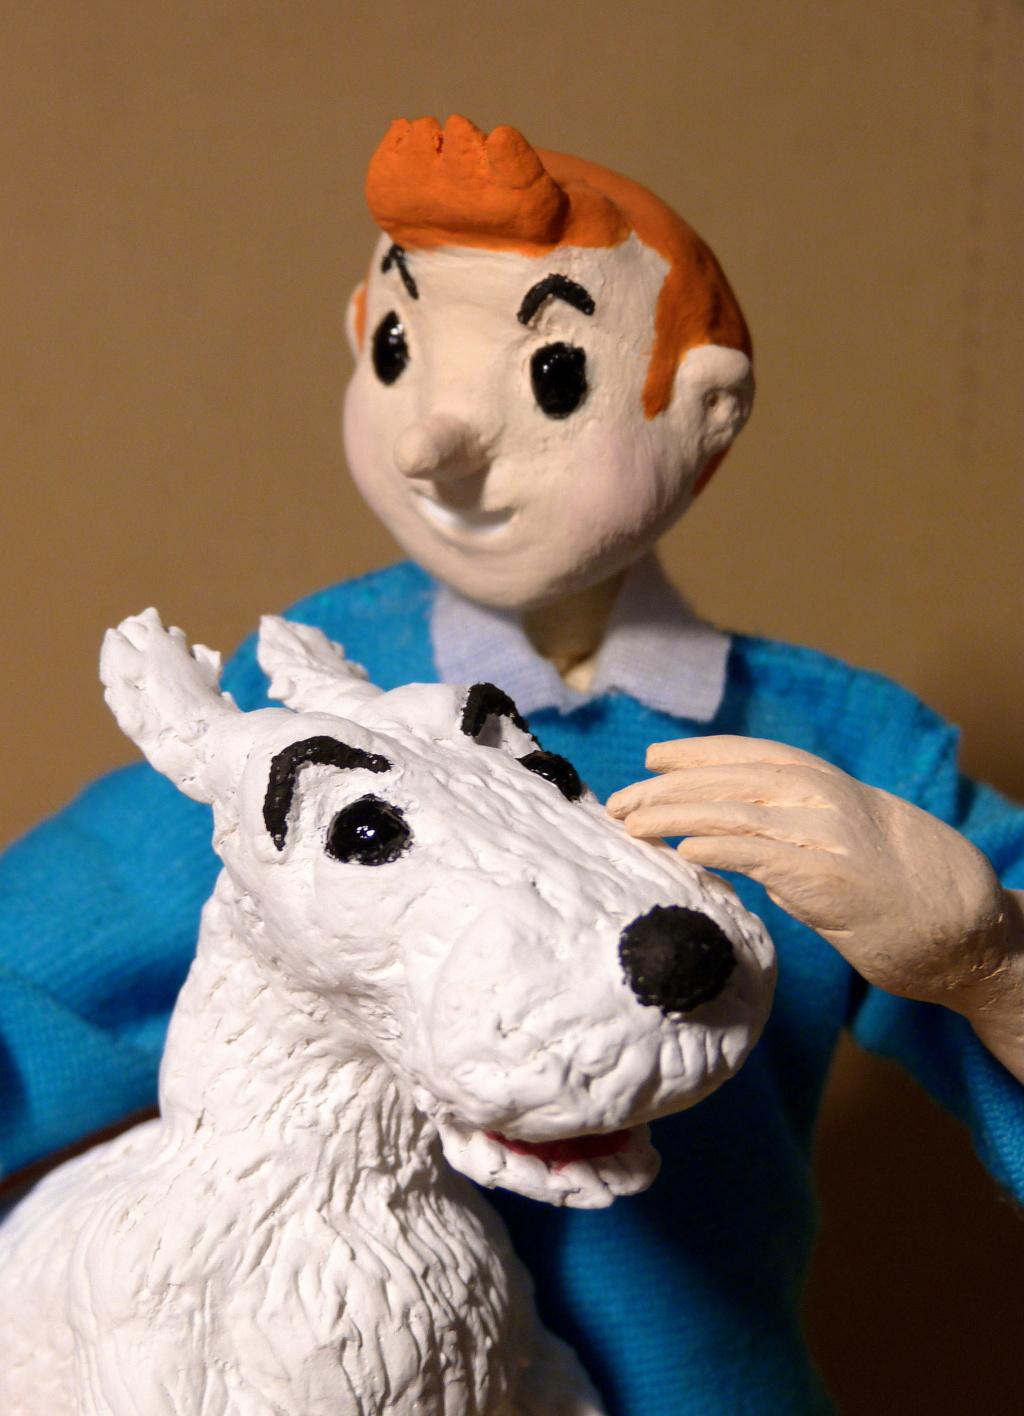 Tintin, Milou et le capitaine Haddock P1080512